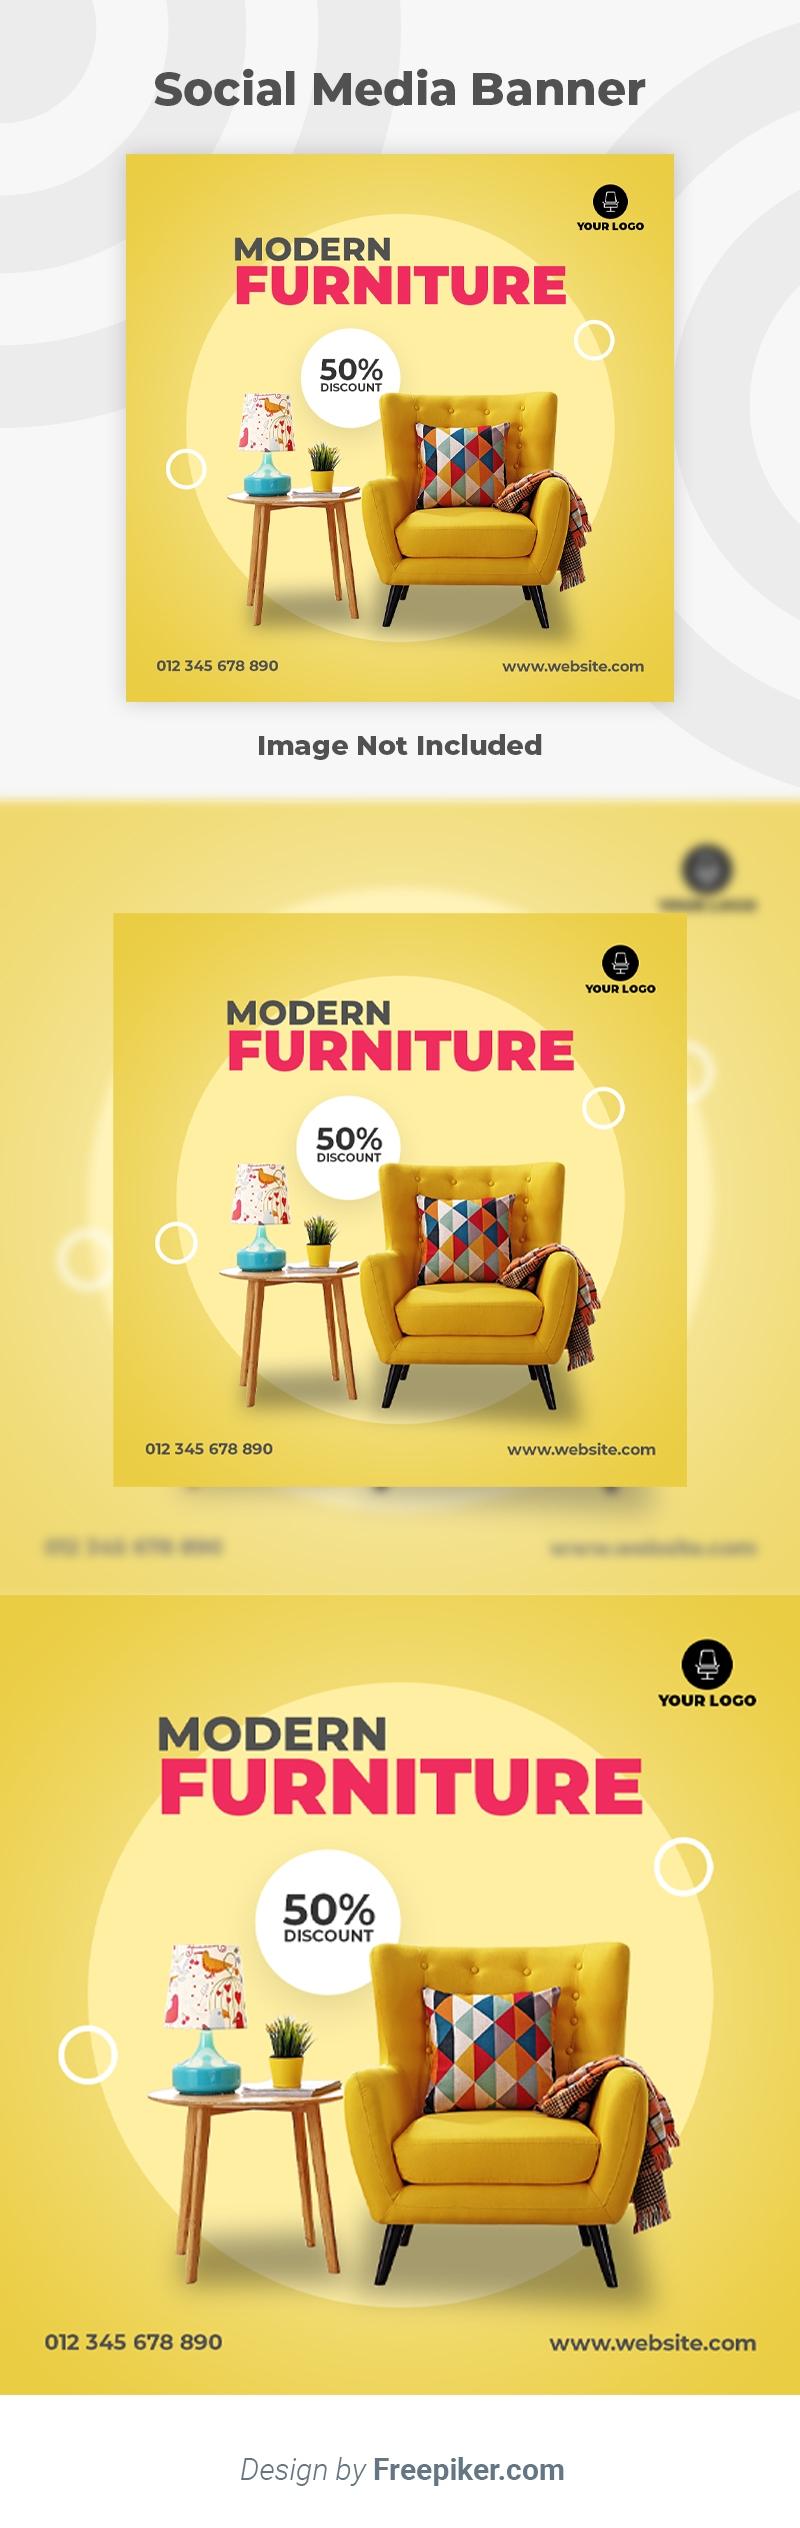 Modern Furniture Social Media Banner